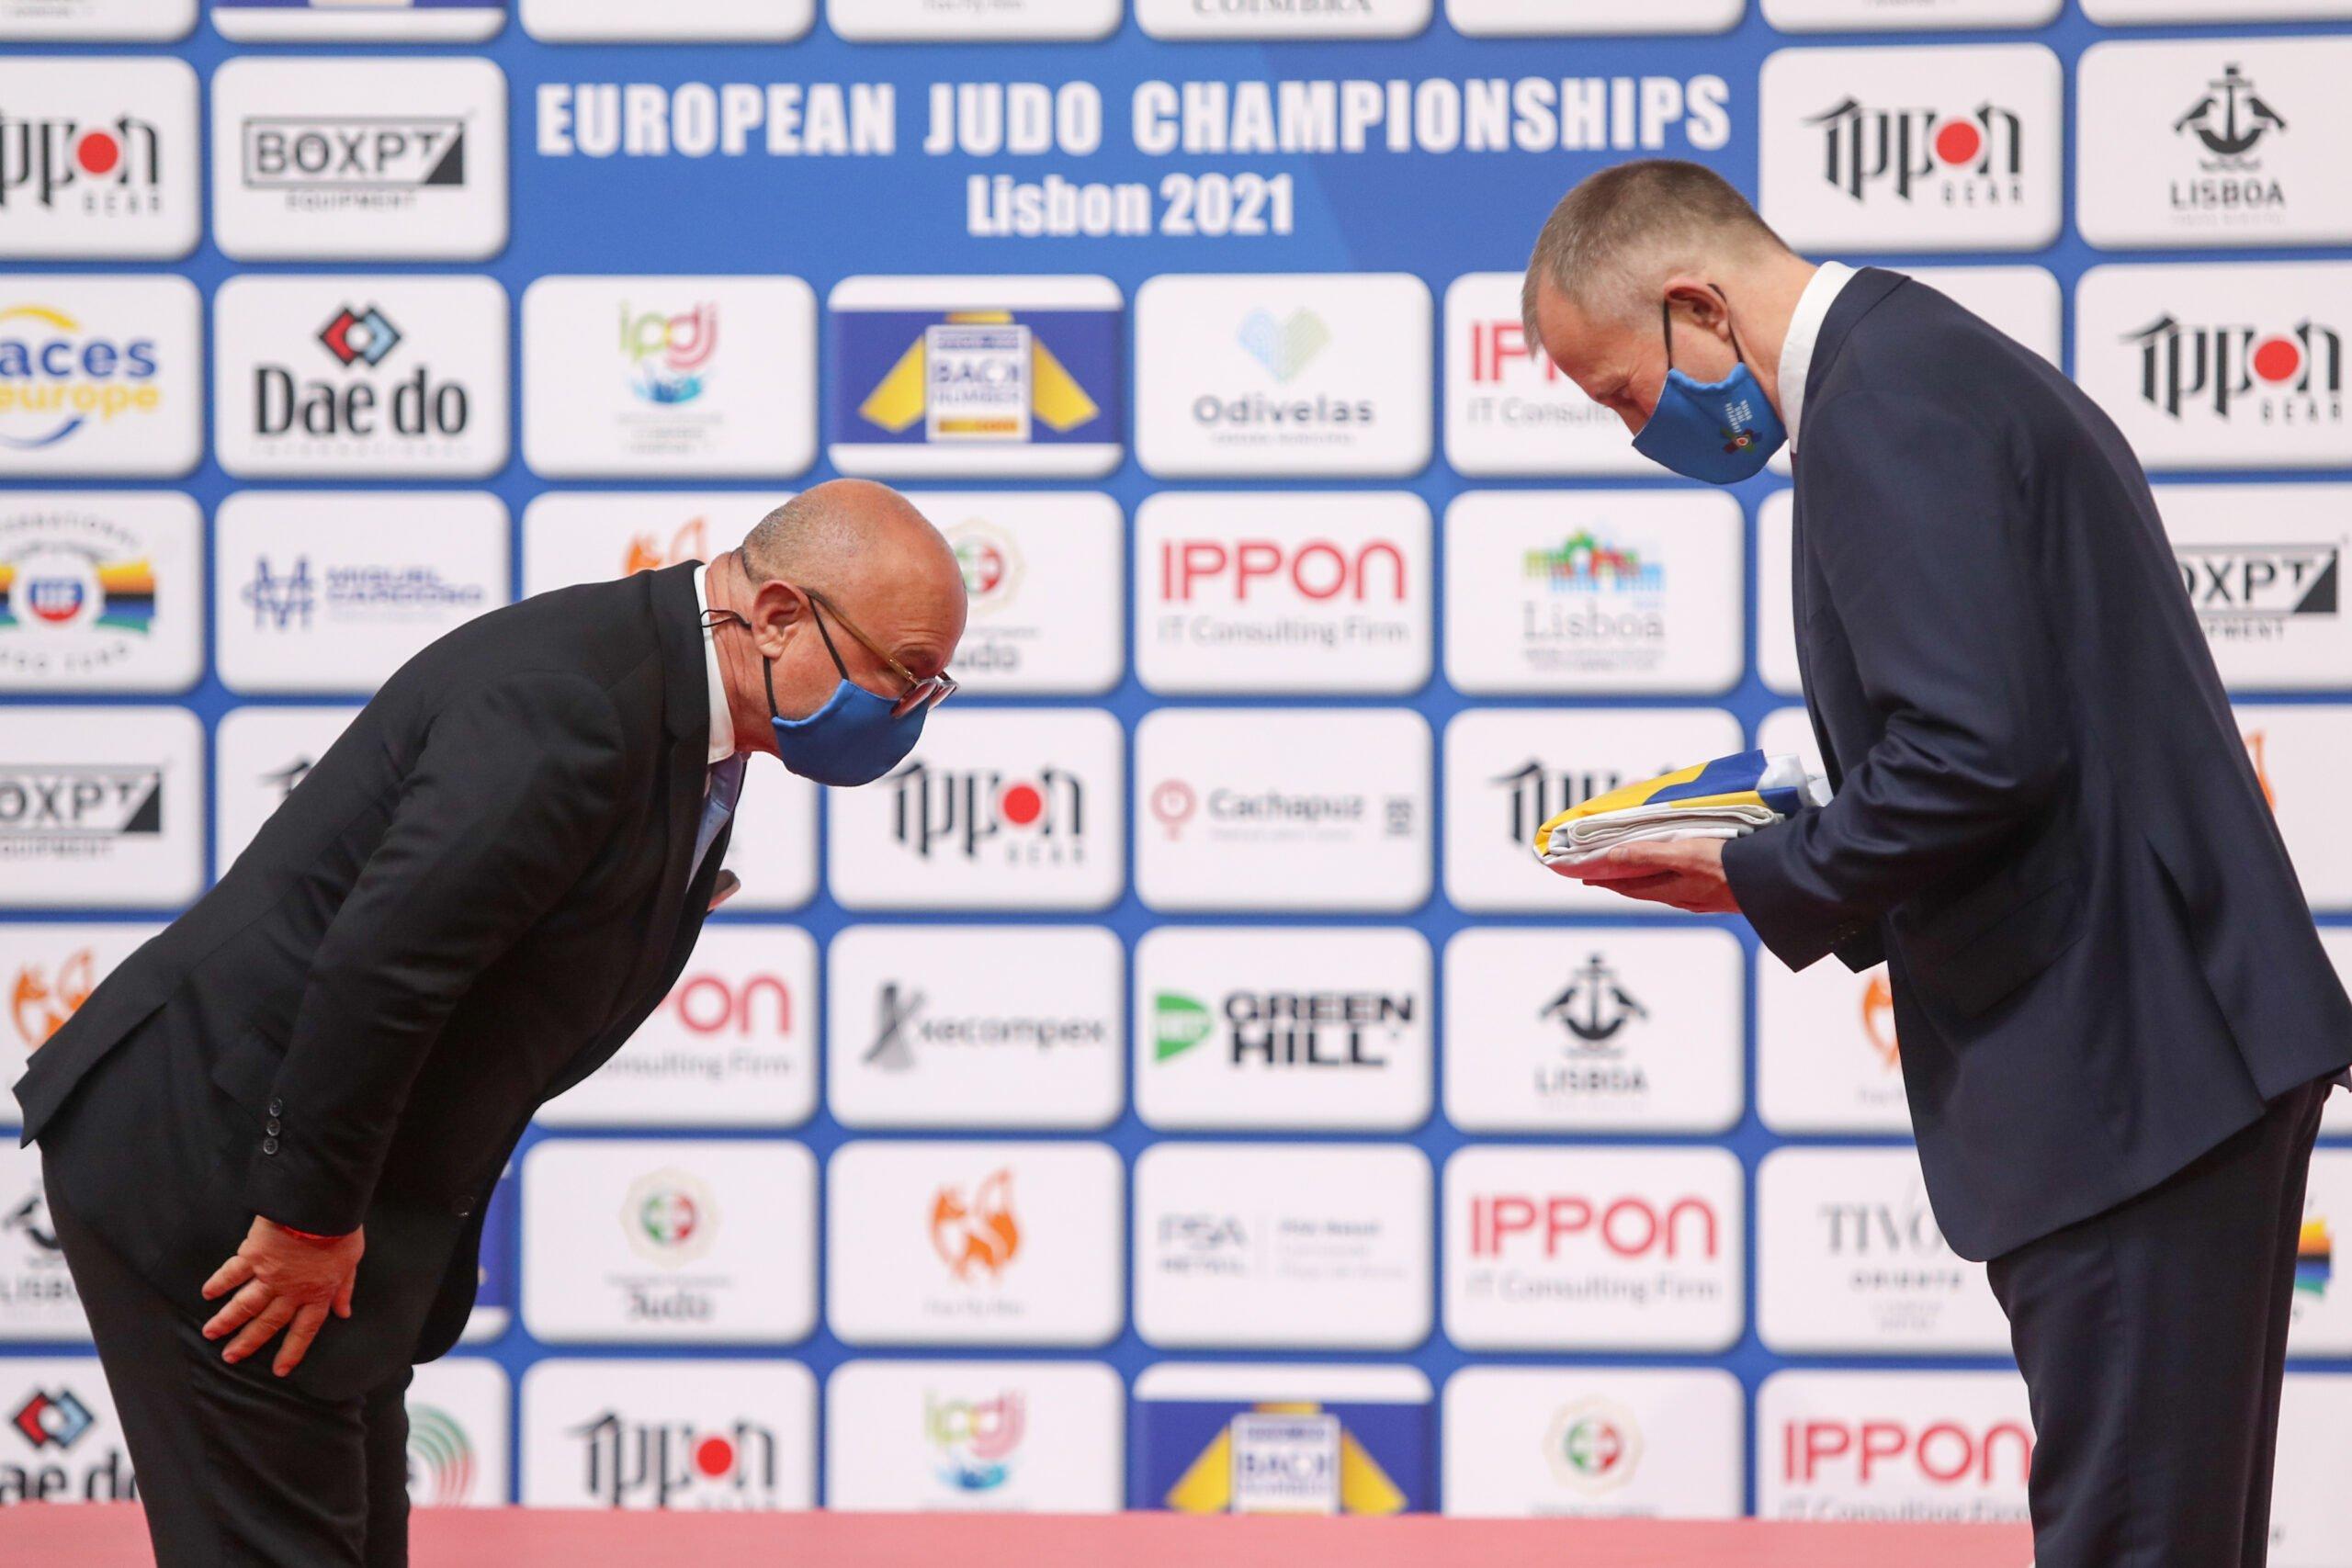 BULGARIA TO HOST 2022 EUROPEAN CHAMPIONSHIPS